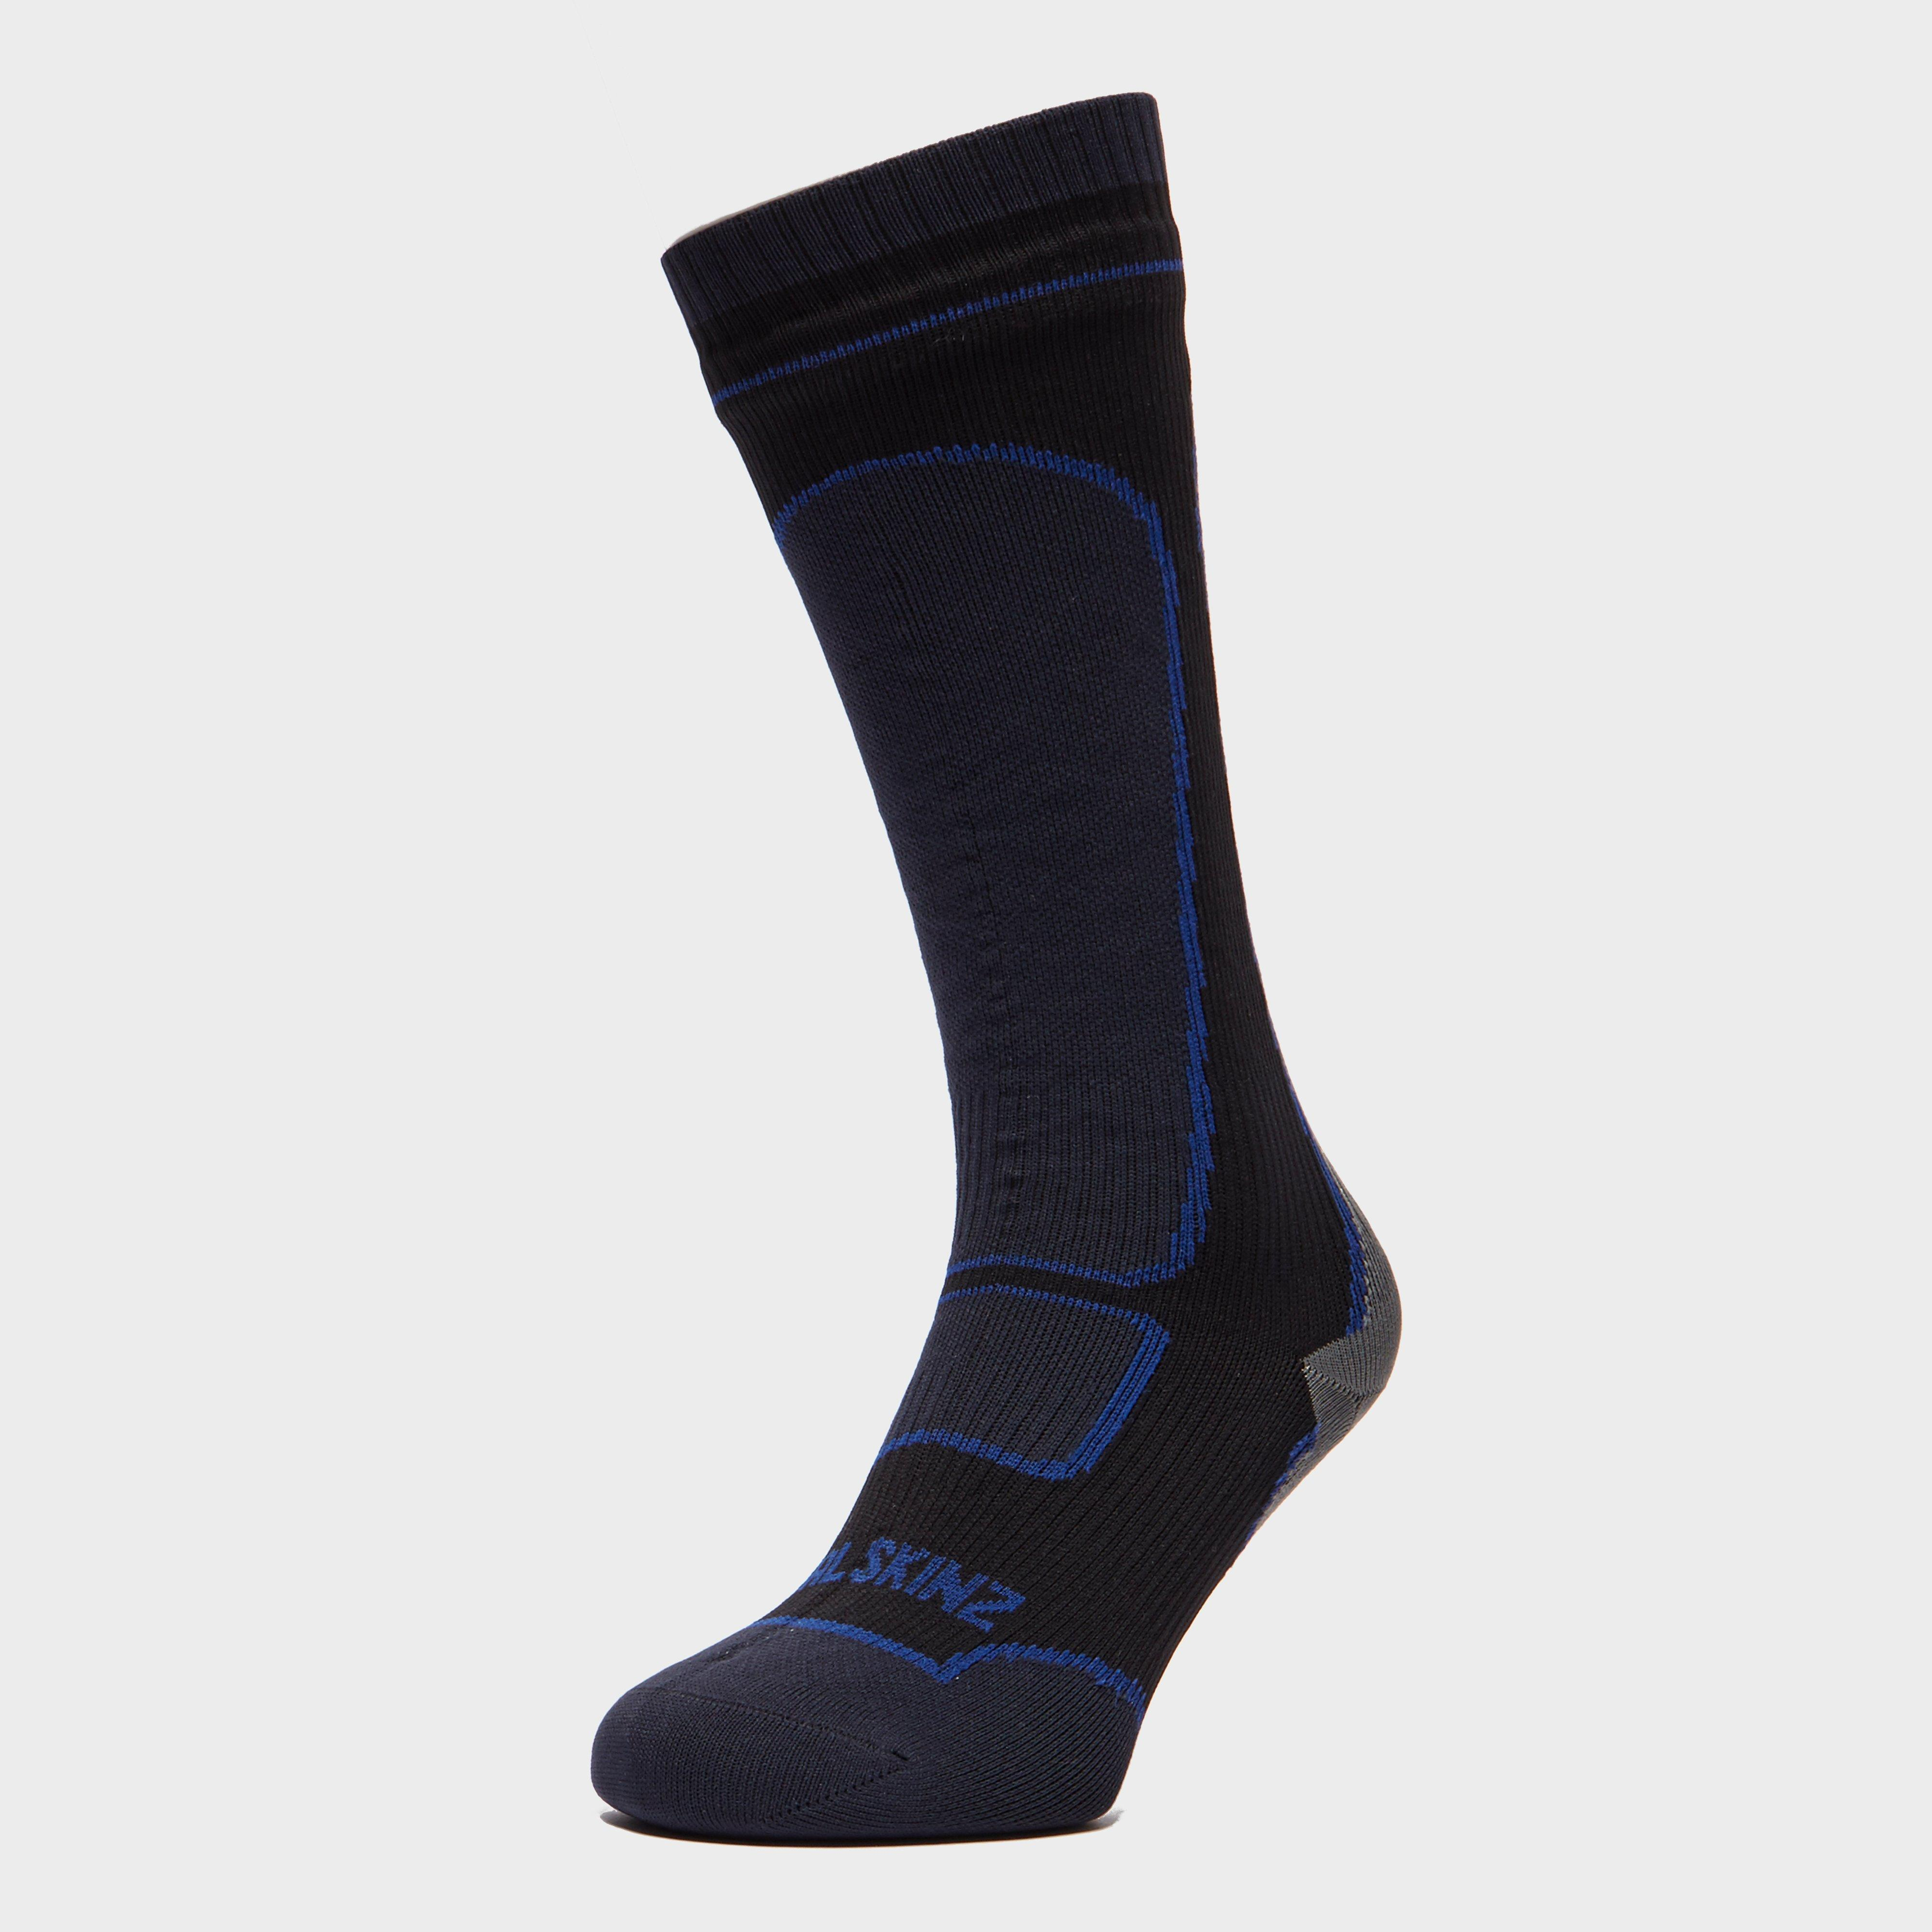 SealSkinz Sealskinz Mens Mid-Weight Knee-Length Socks - Black, Black